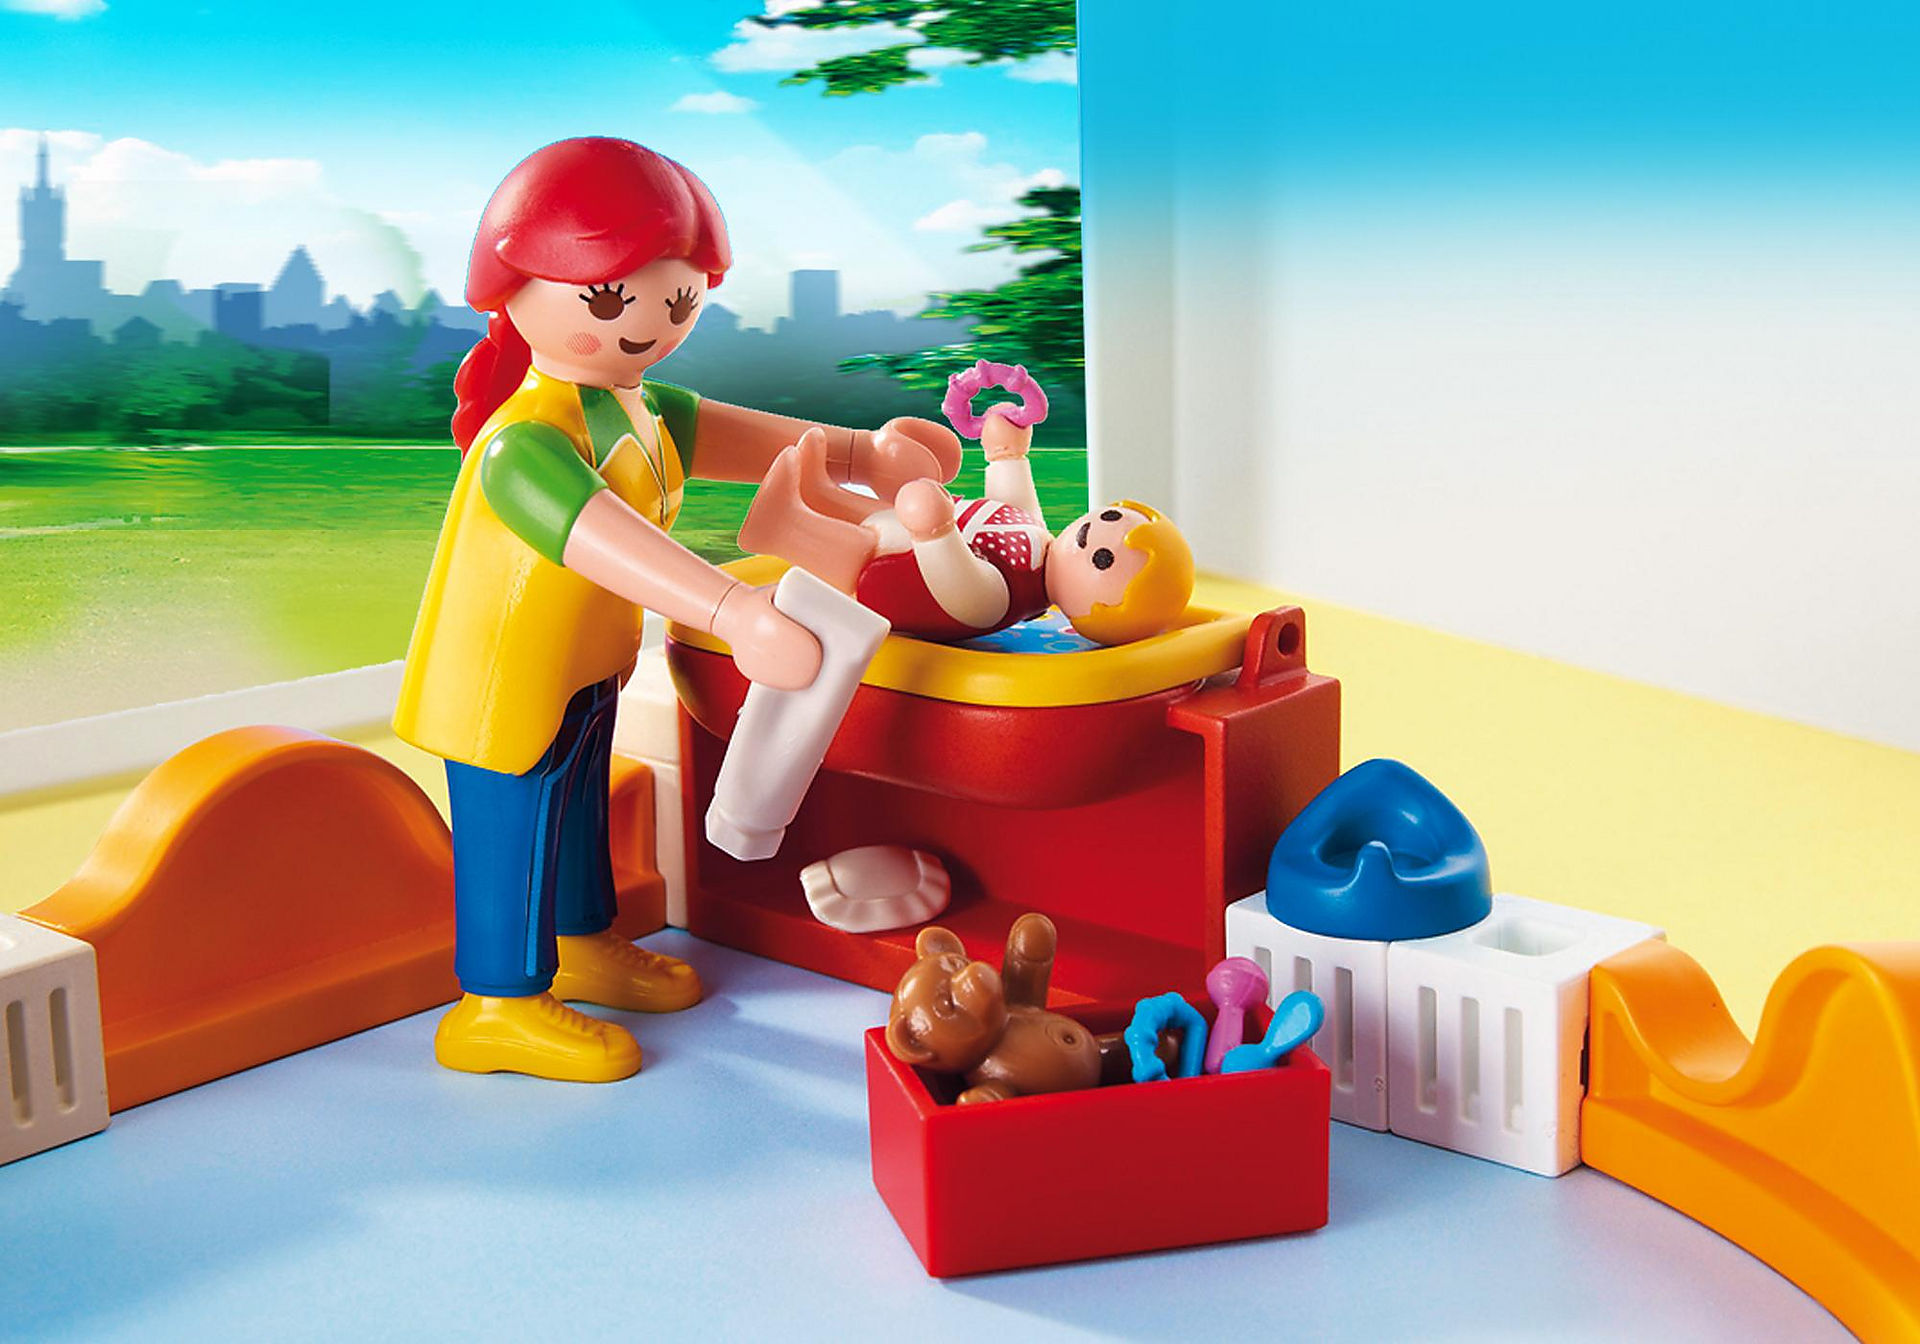 http://media.playmobil.com/i/playmobil/5570_product_extra1/Espace crèche avec bébés